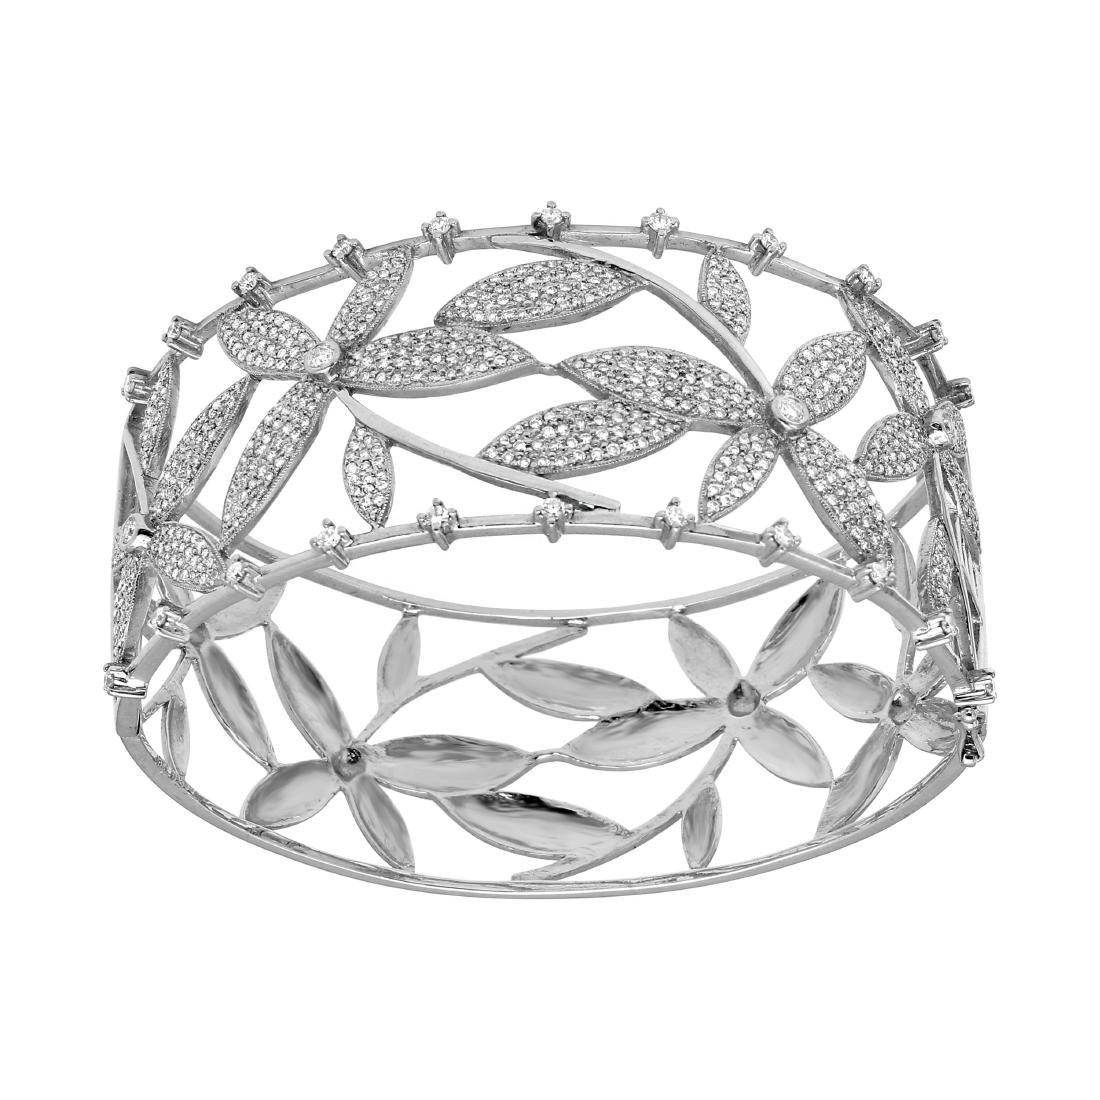 18KT White Gold Diamond Bangle Bracelet - 3